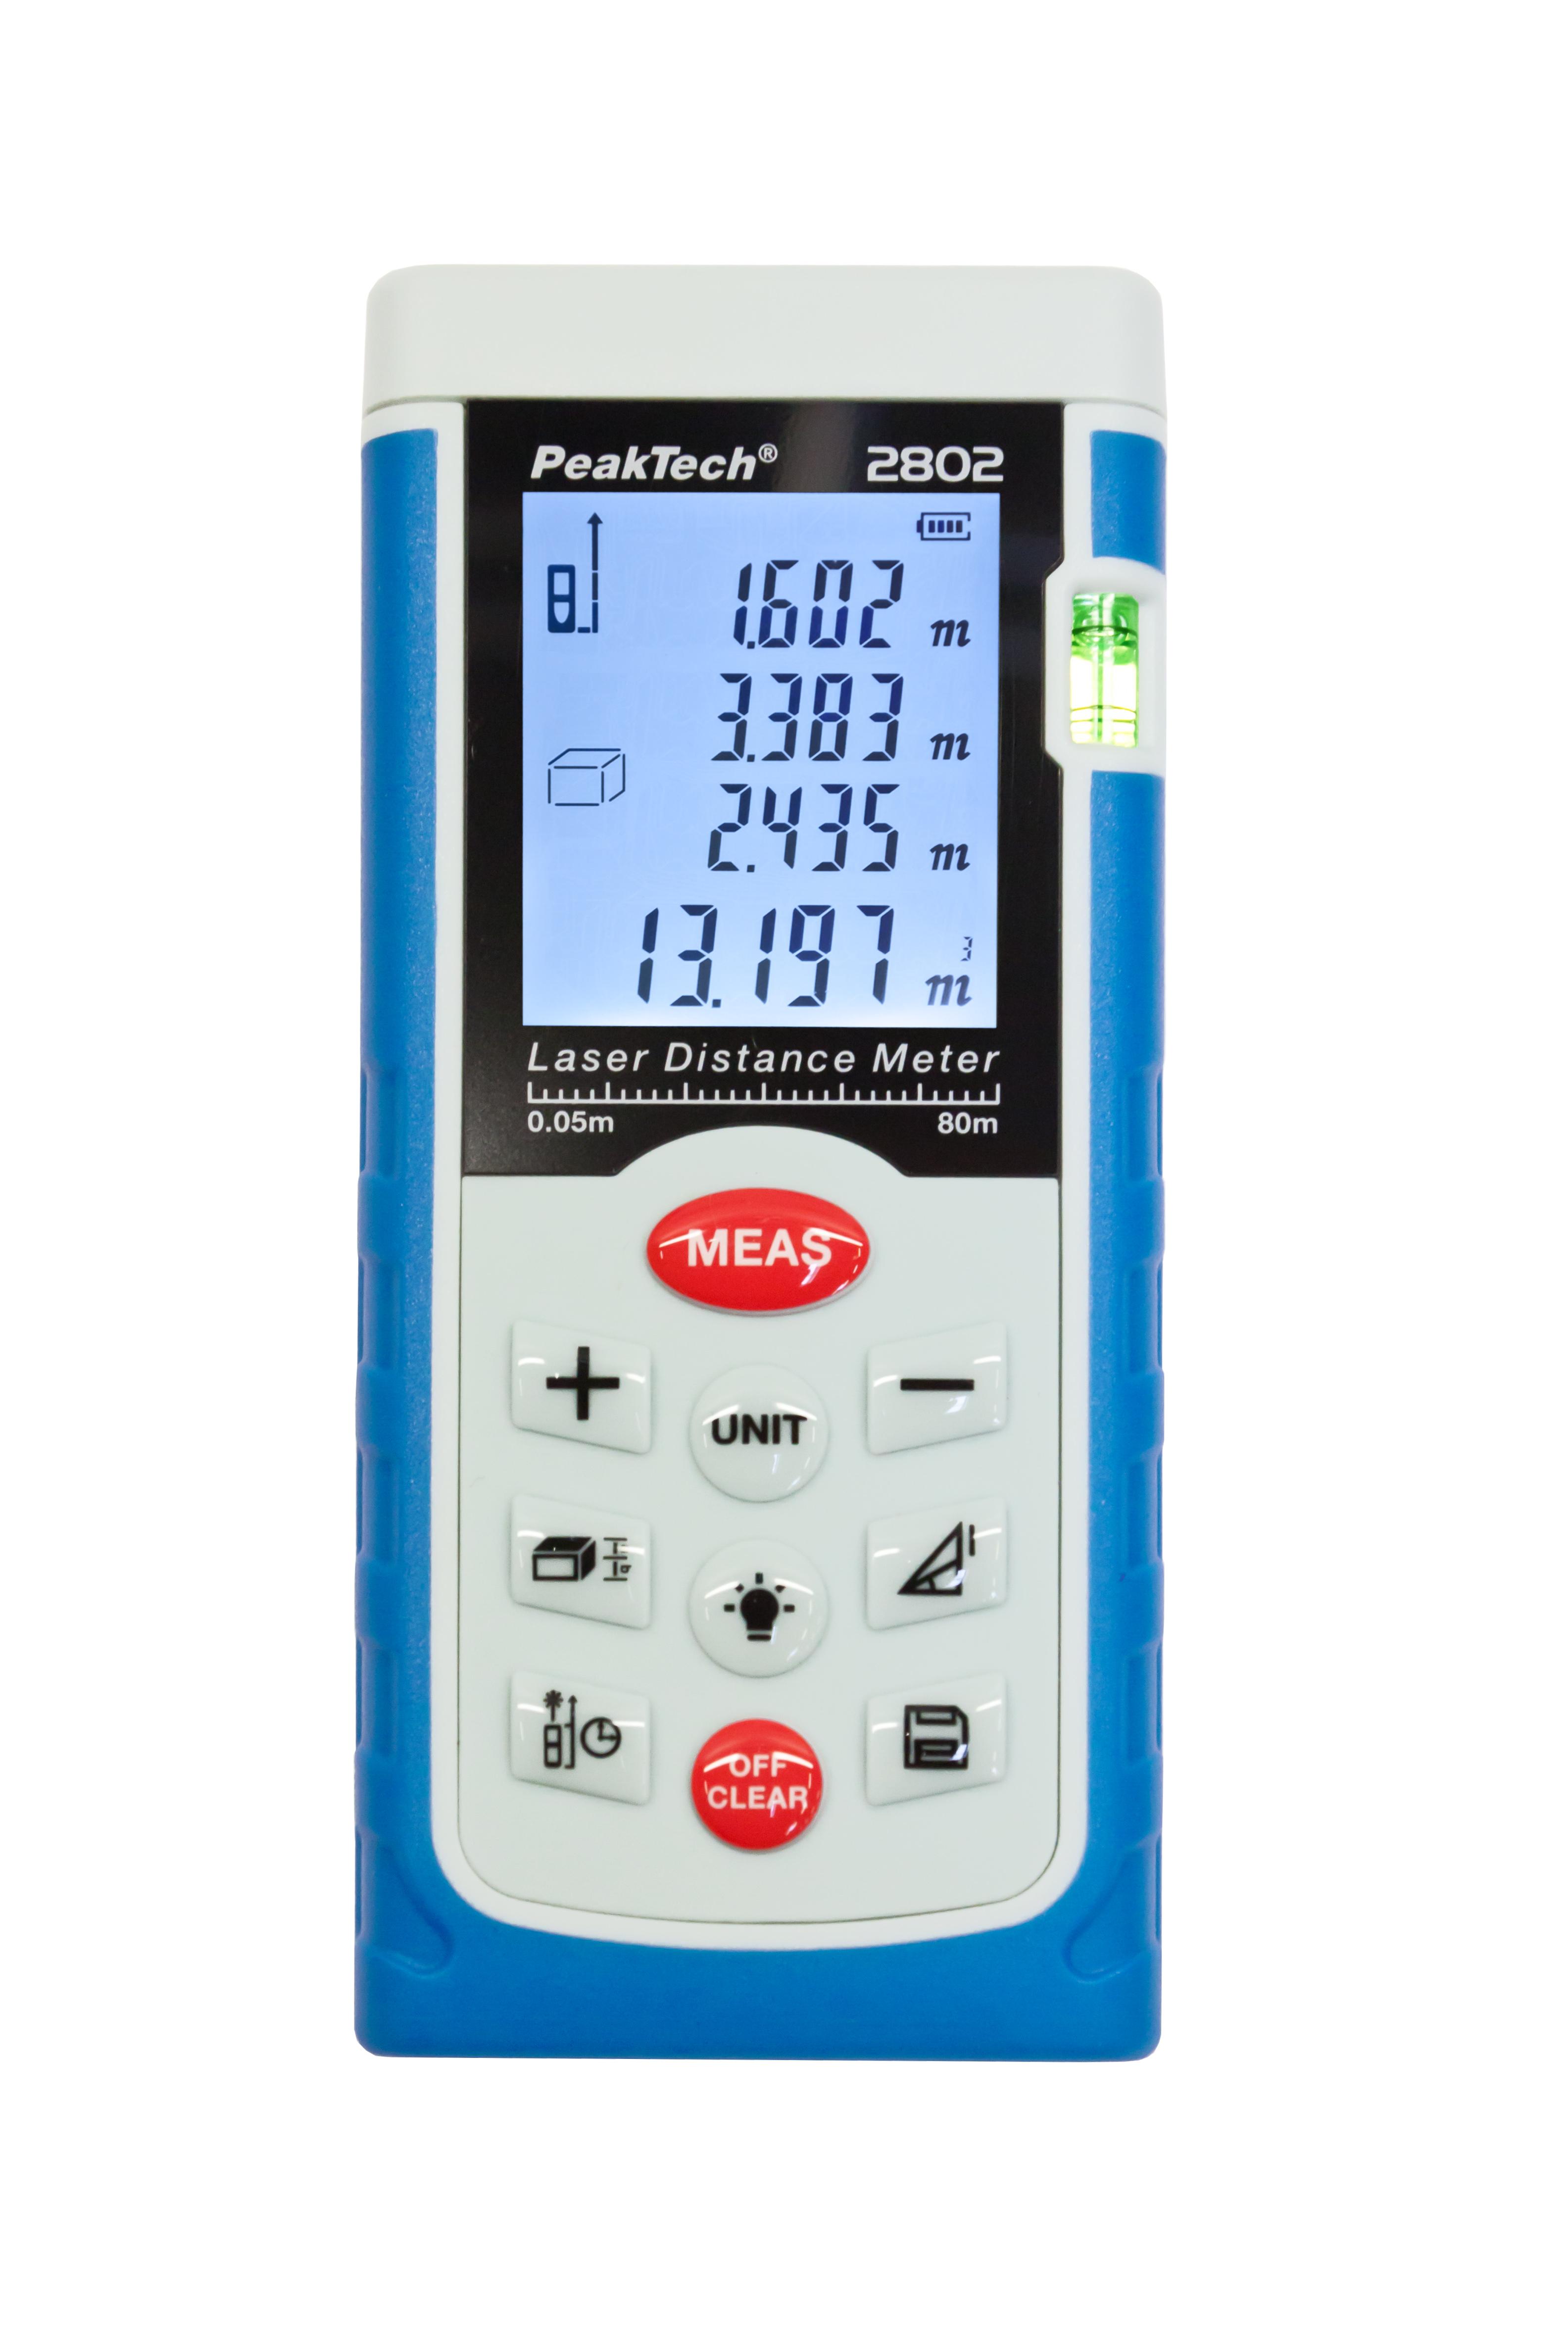 «PeakTech® P 2802» Laser distance meter up to 80 meters